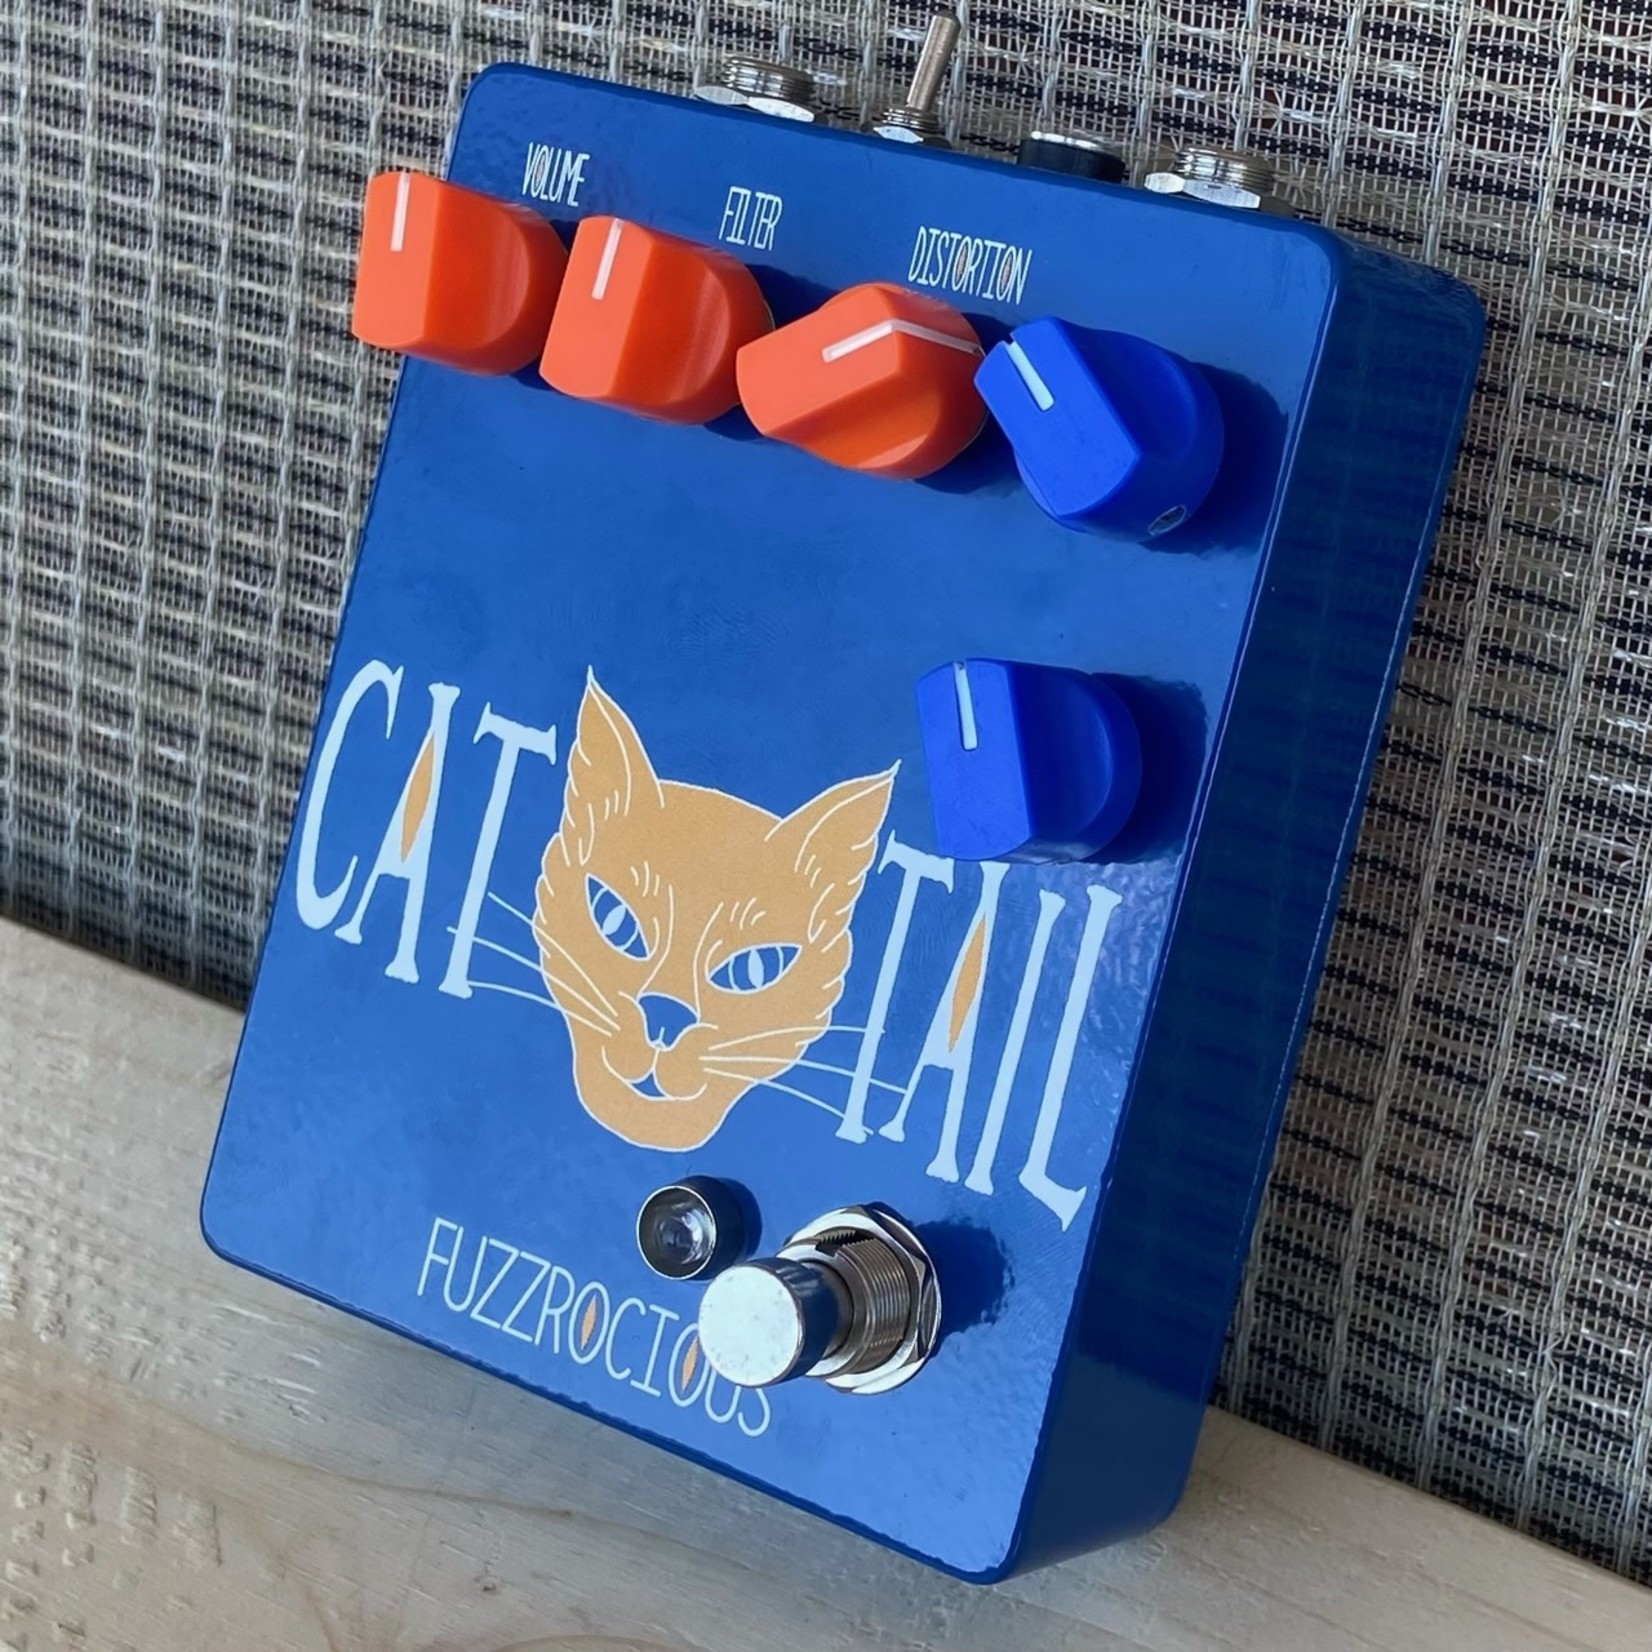 Fuzzrocious Fuzzrocious Cat Tail OD/Distortion